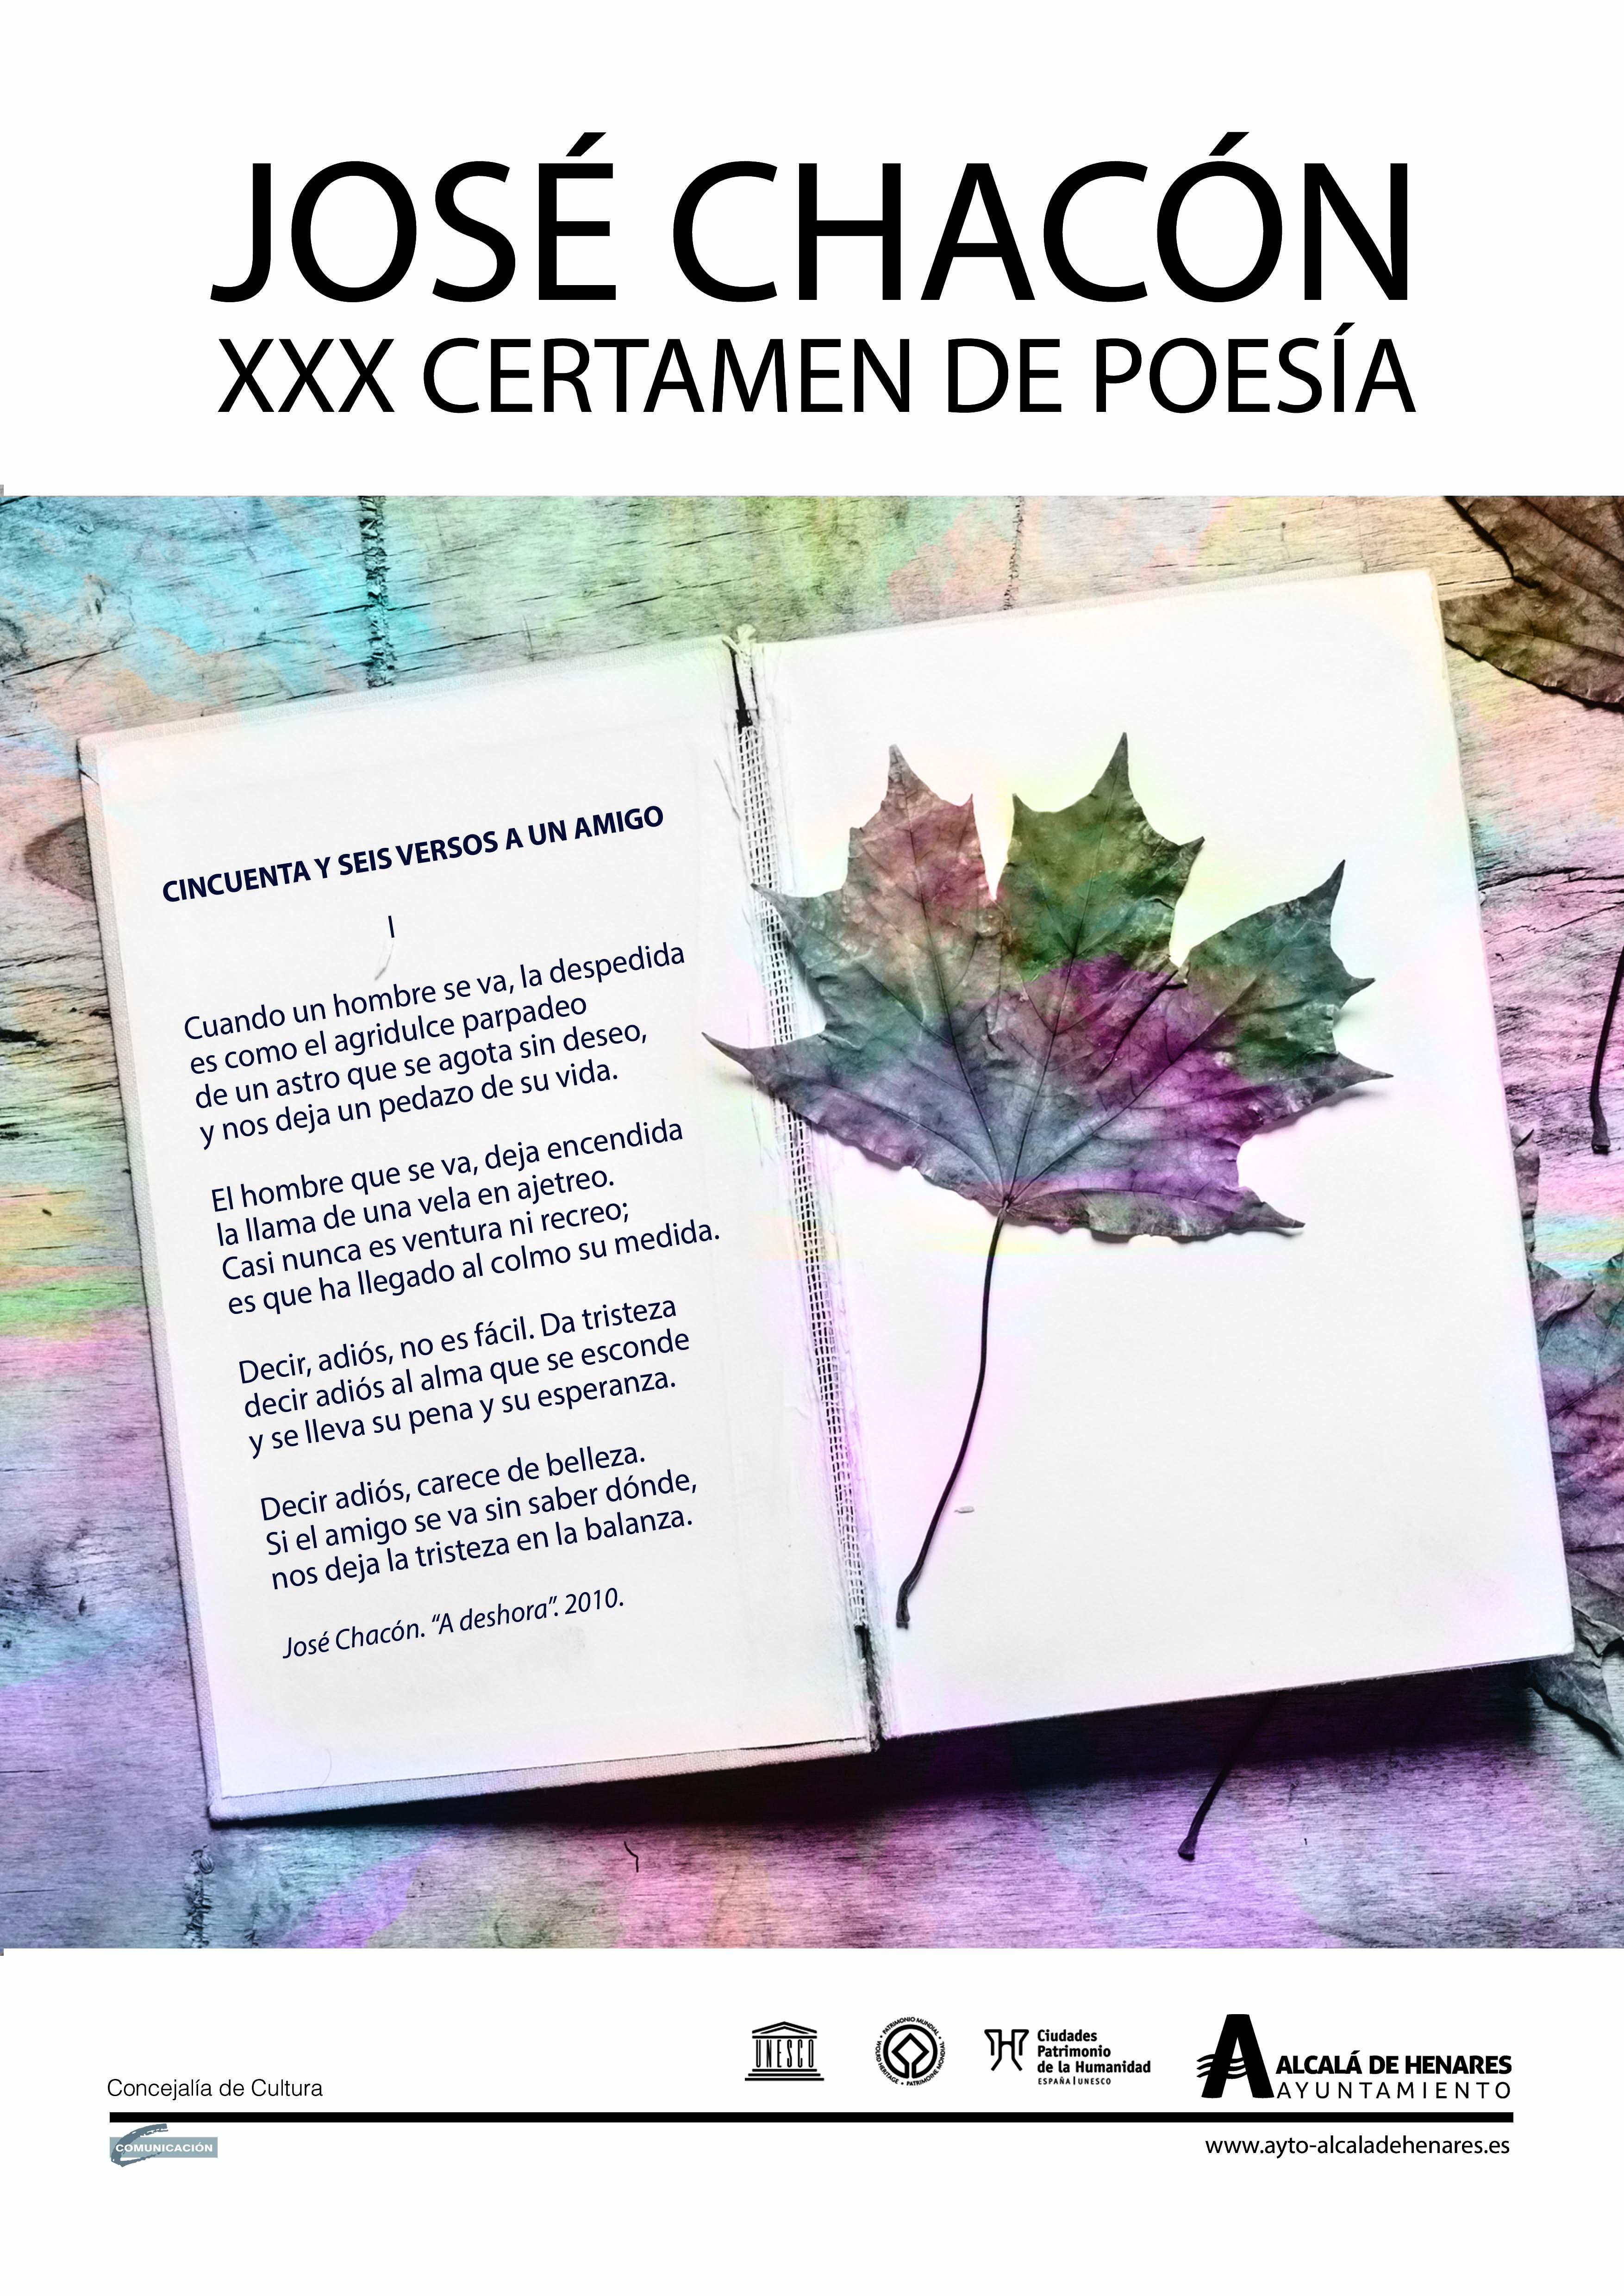 XXX Certámen de Poesía José Chacón